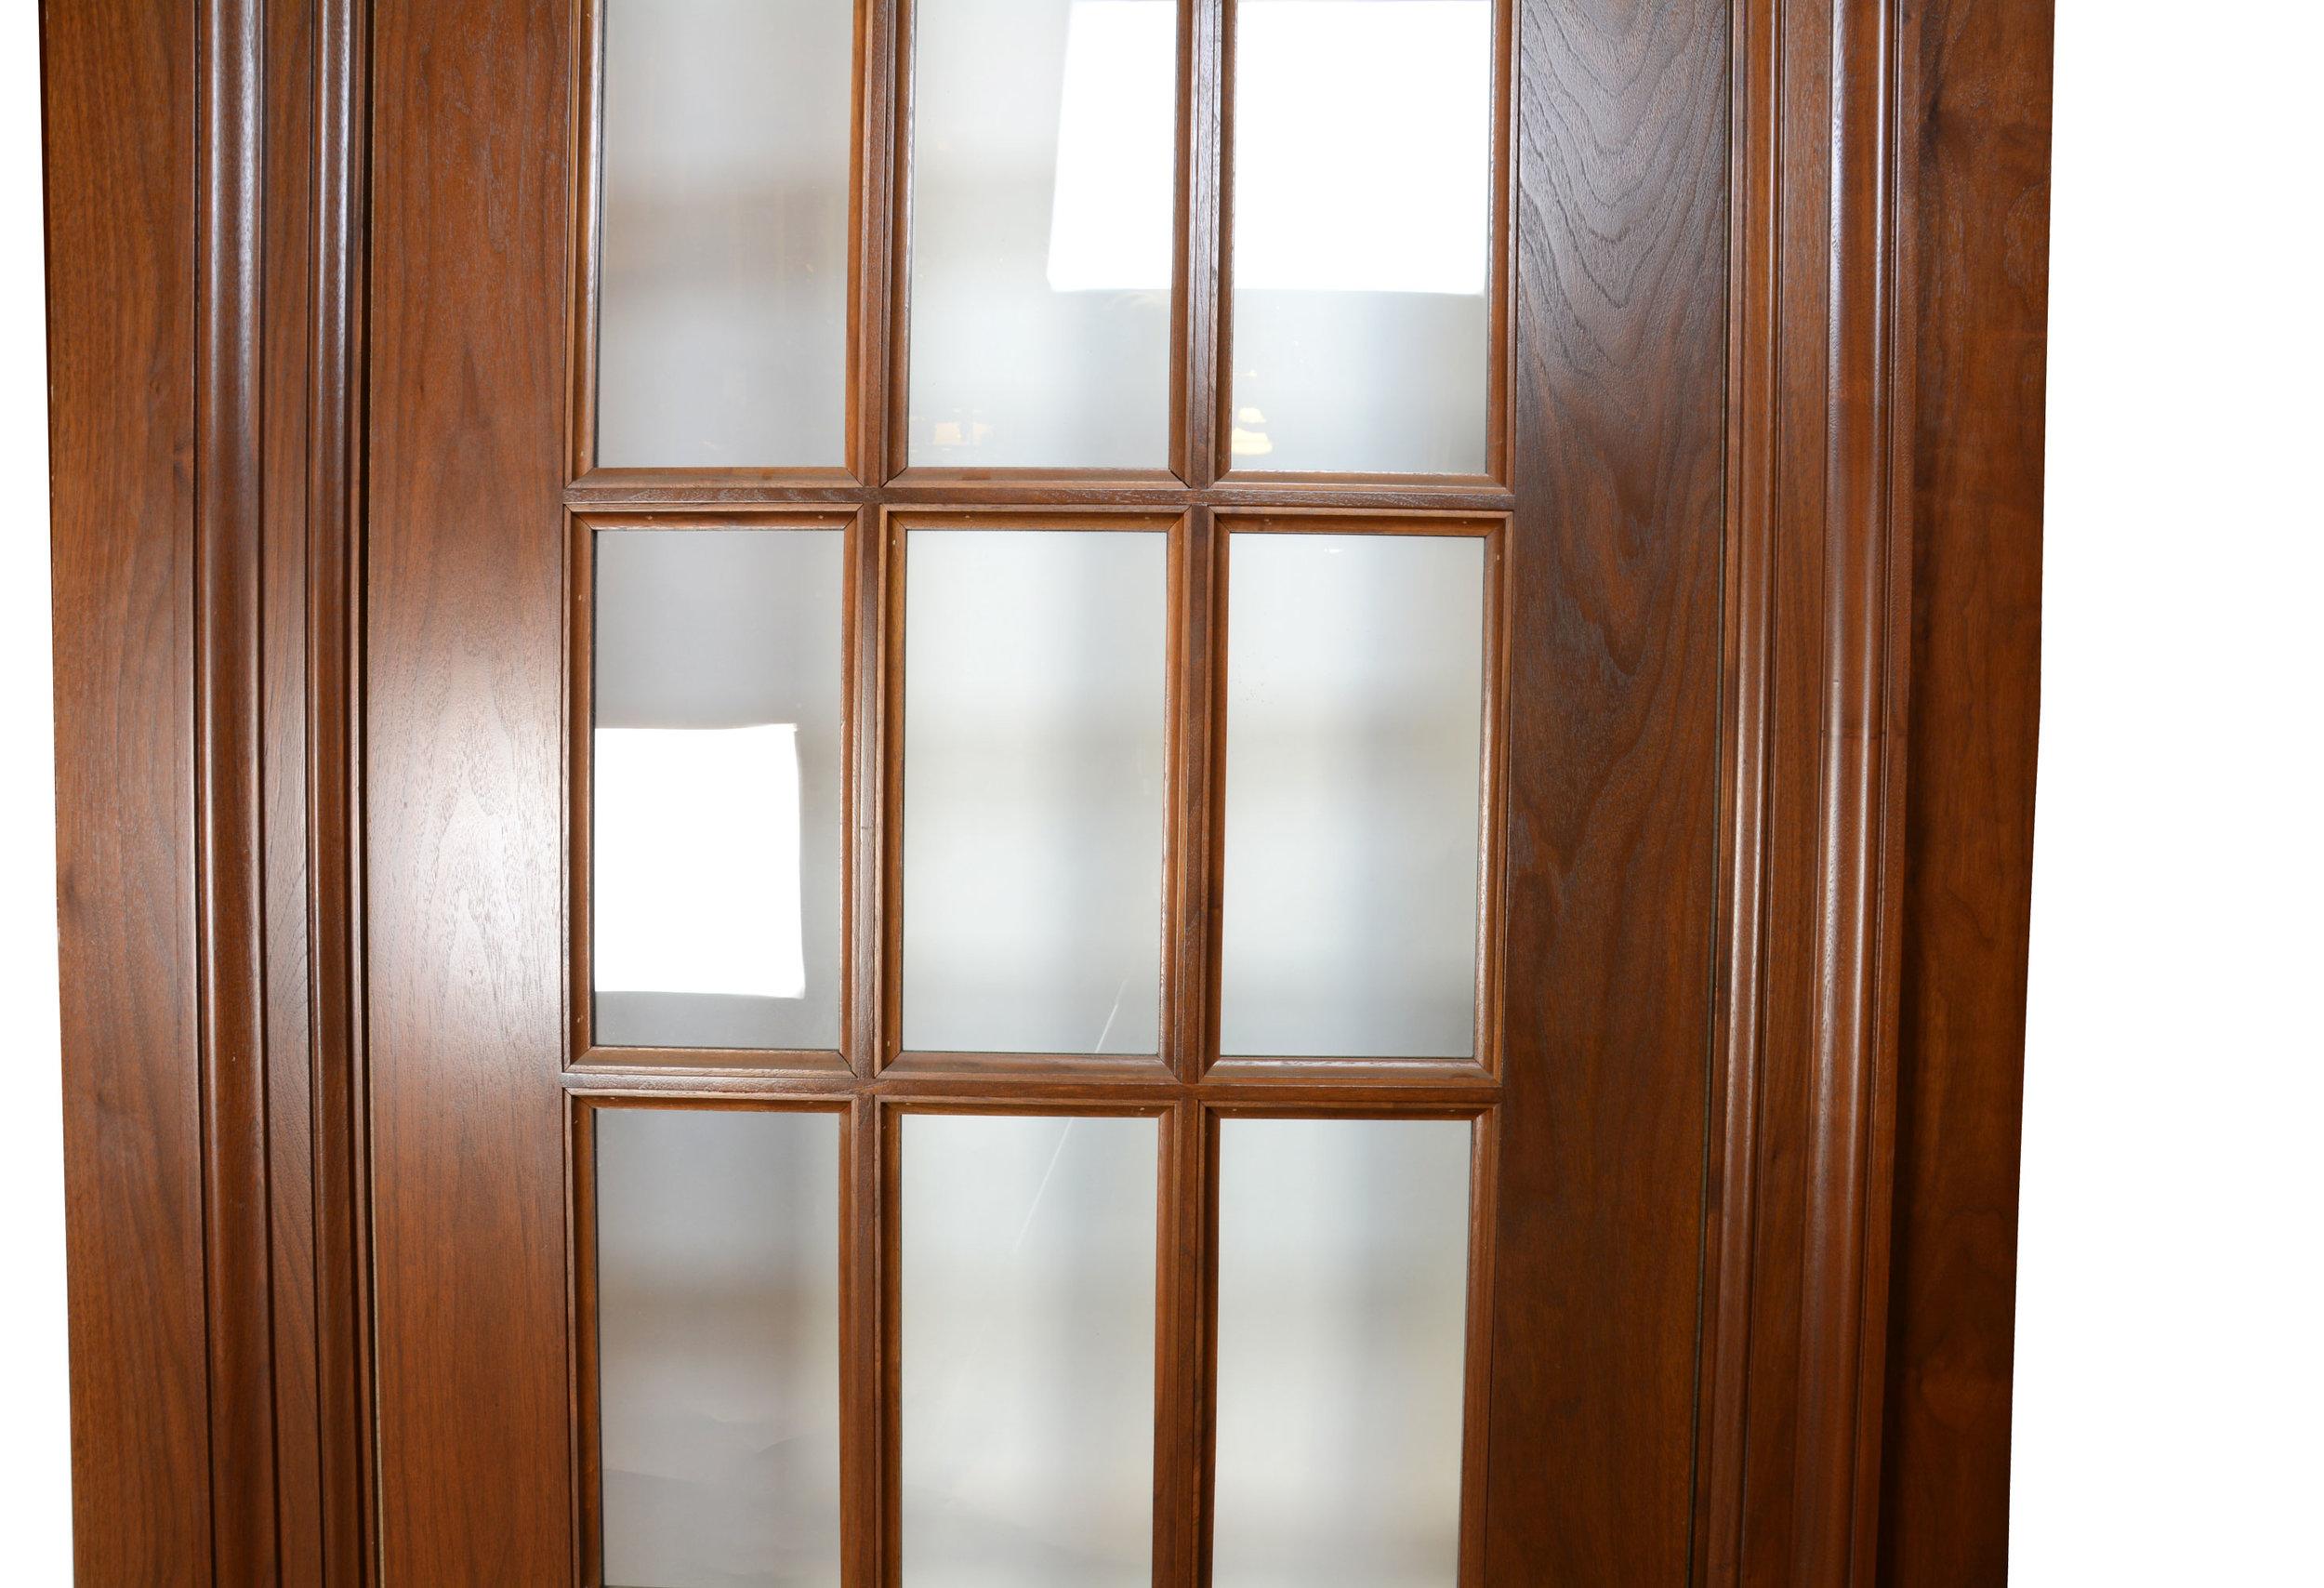 42266-walnut-french-window-doors-DETAIL.jpg